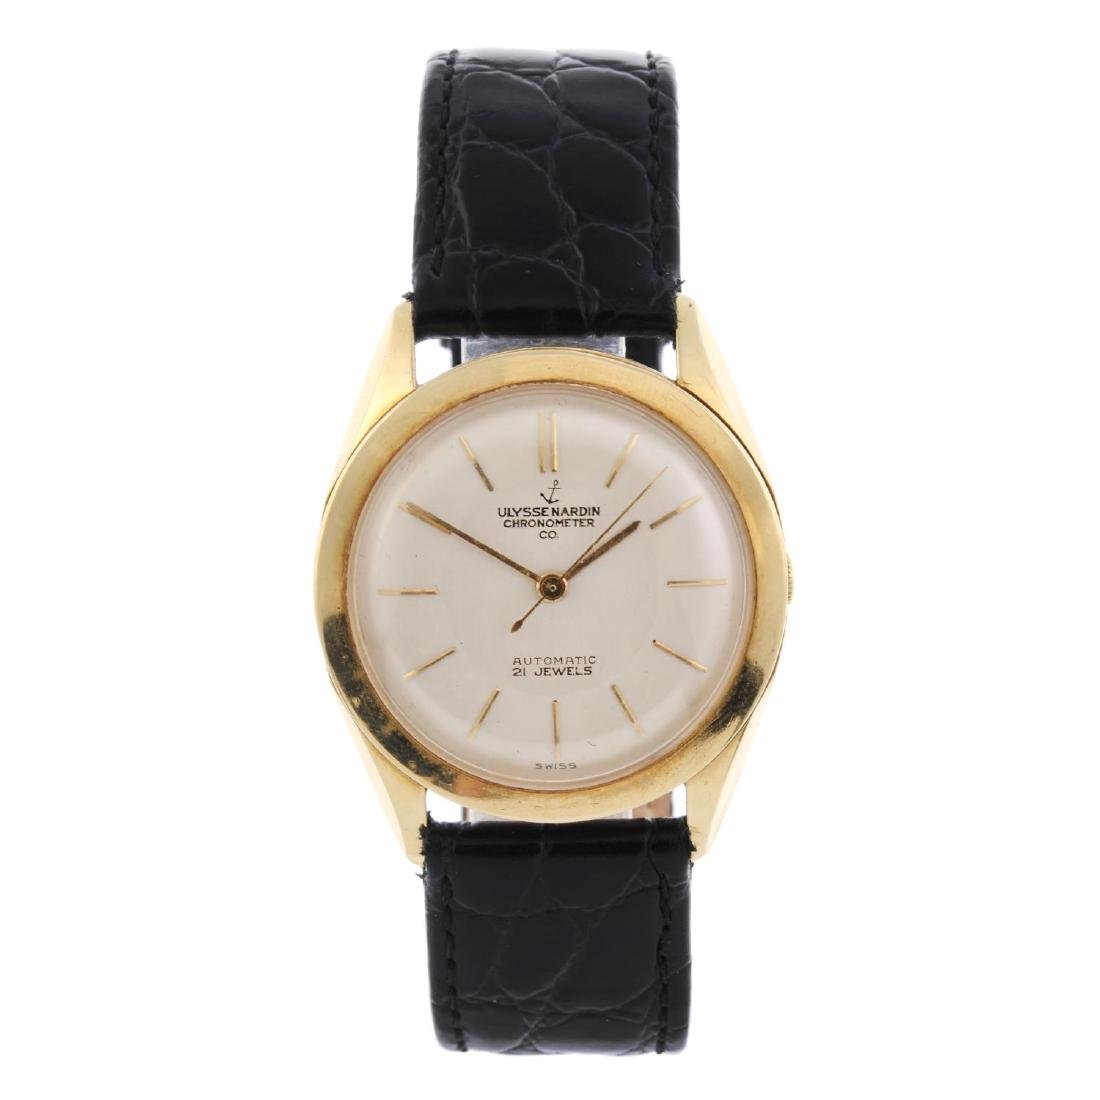 ULYSSE NARDIN - a gentleman's wrist watch. Yellow metal